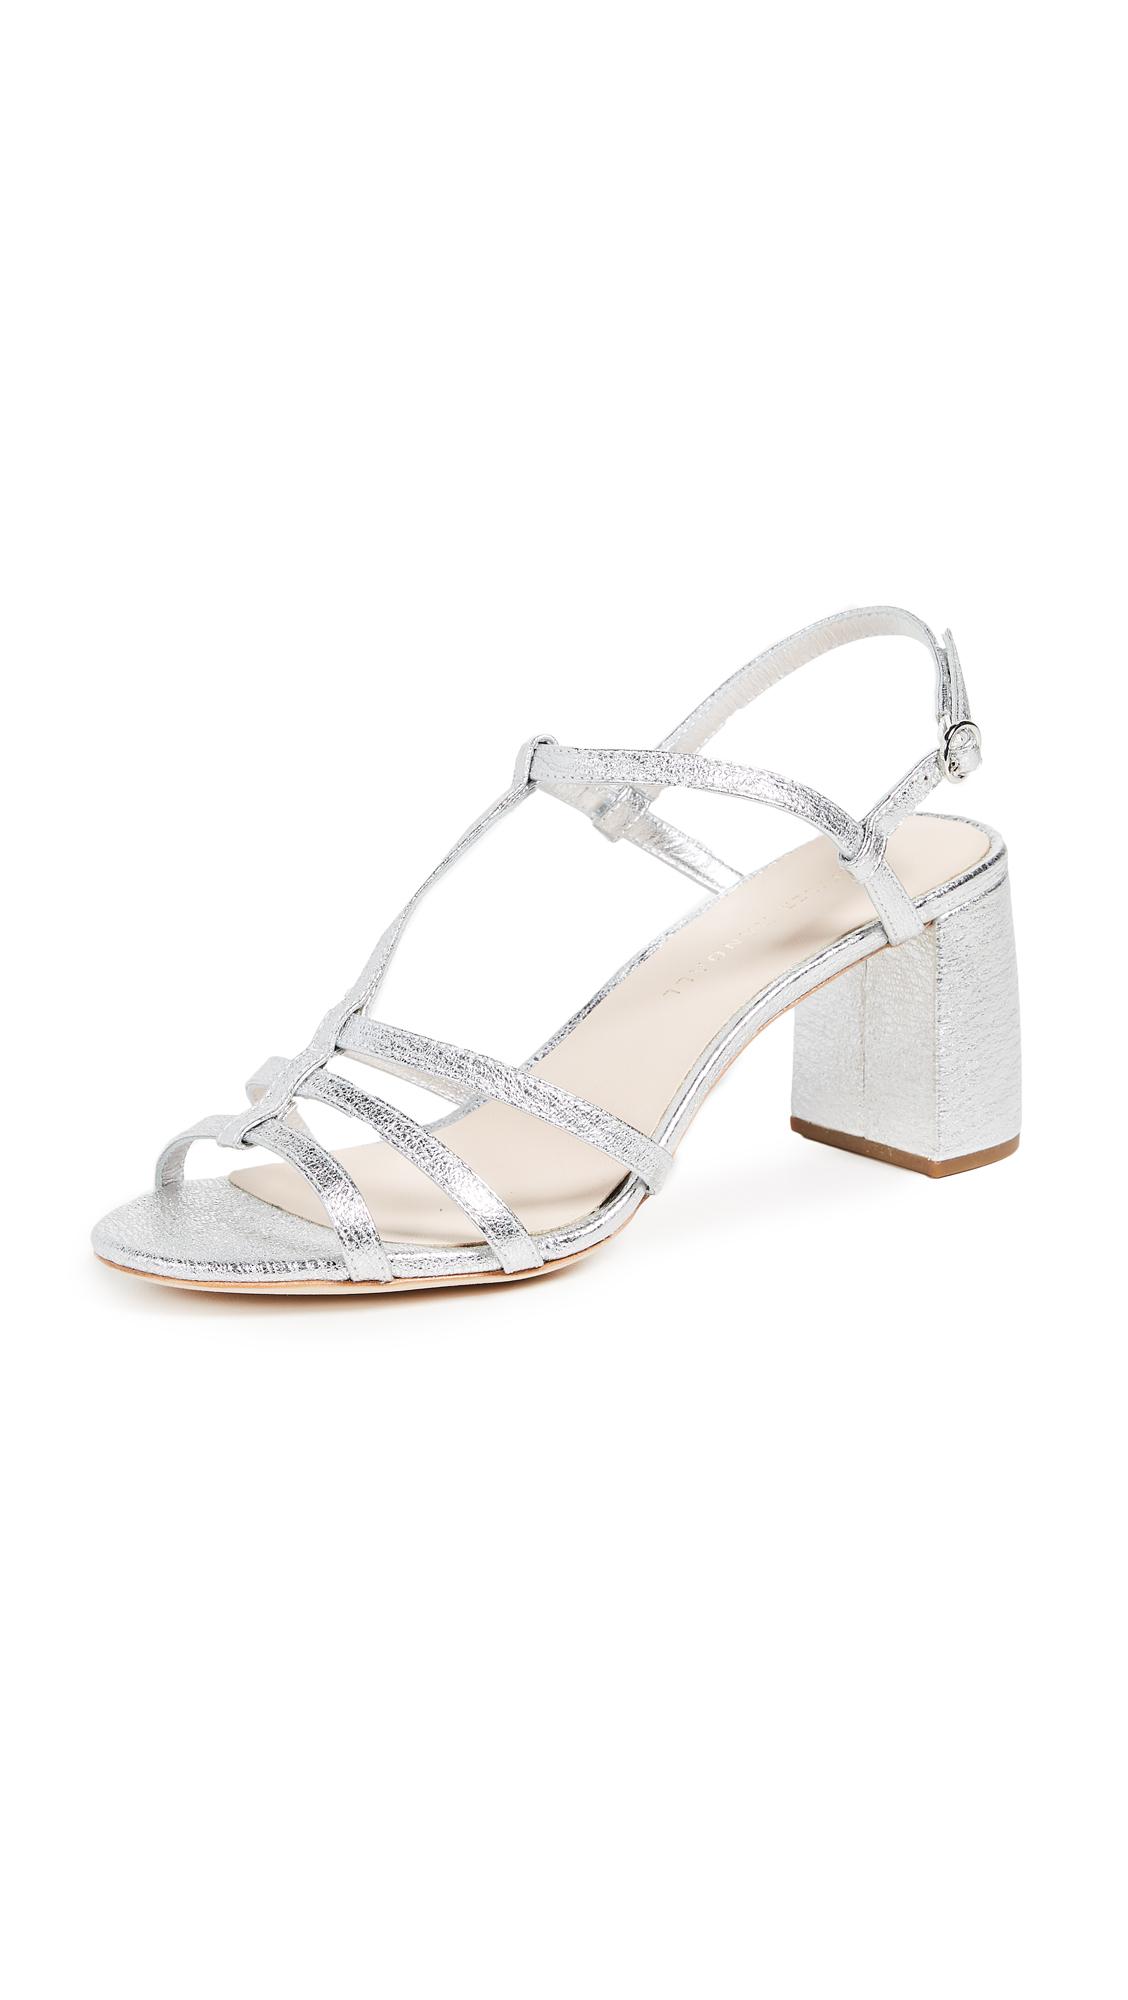 Loeffler Randall Elena Strappy Sandals - Silver